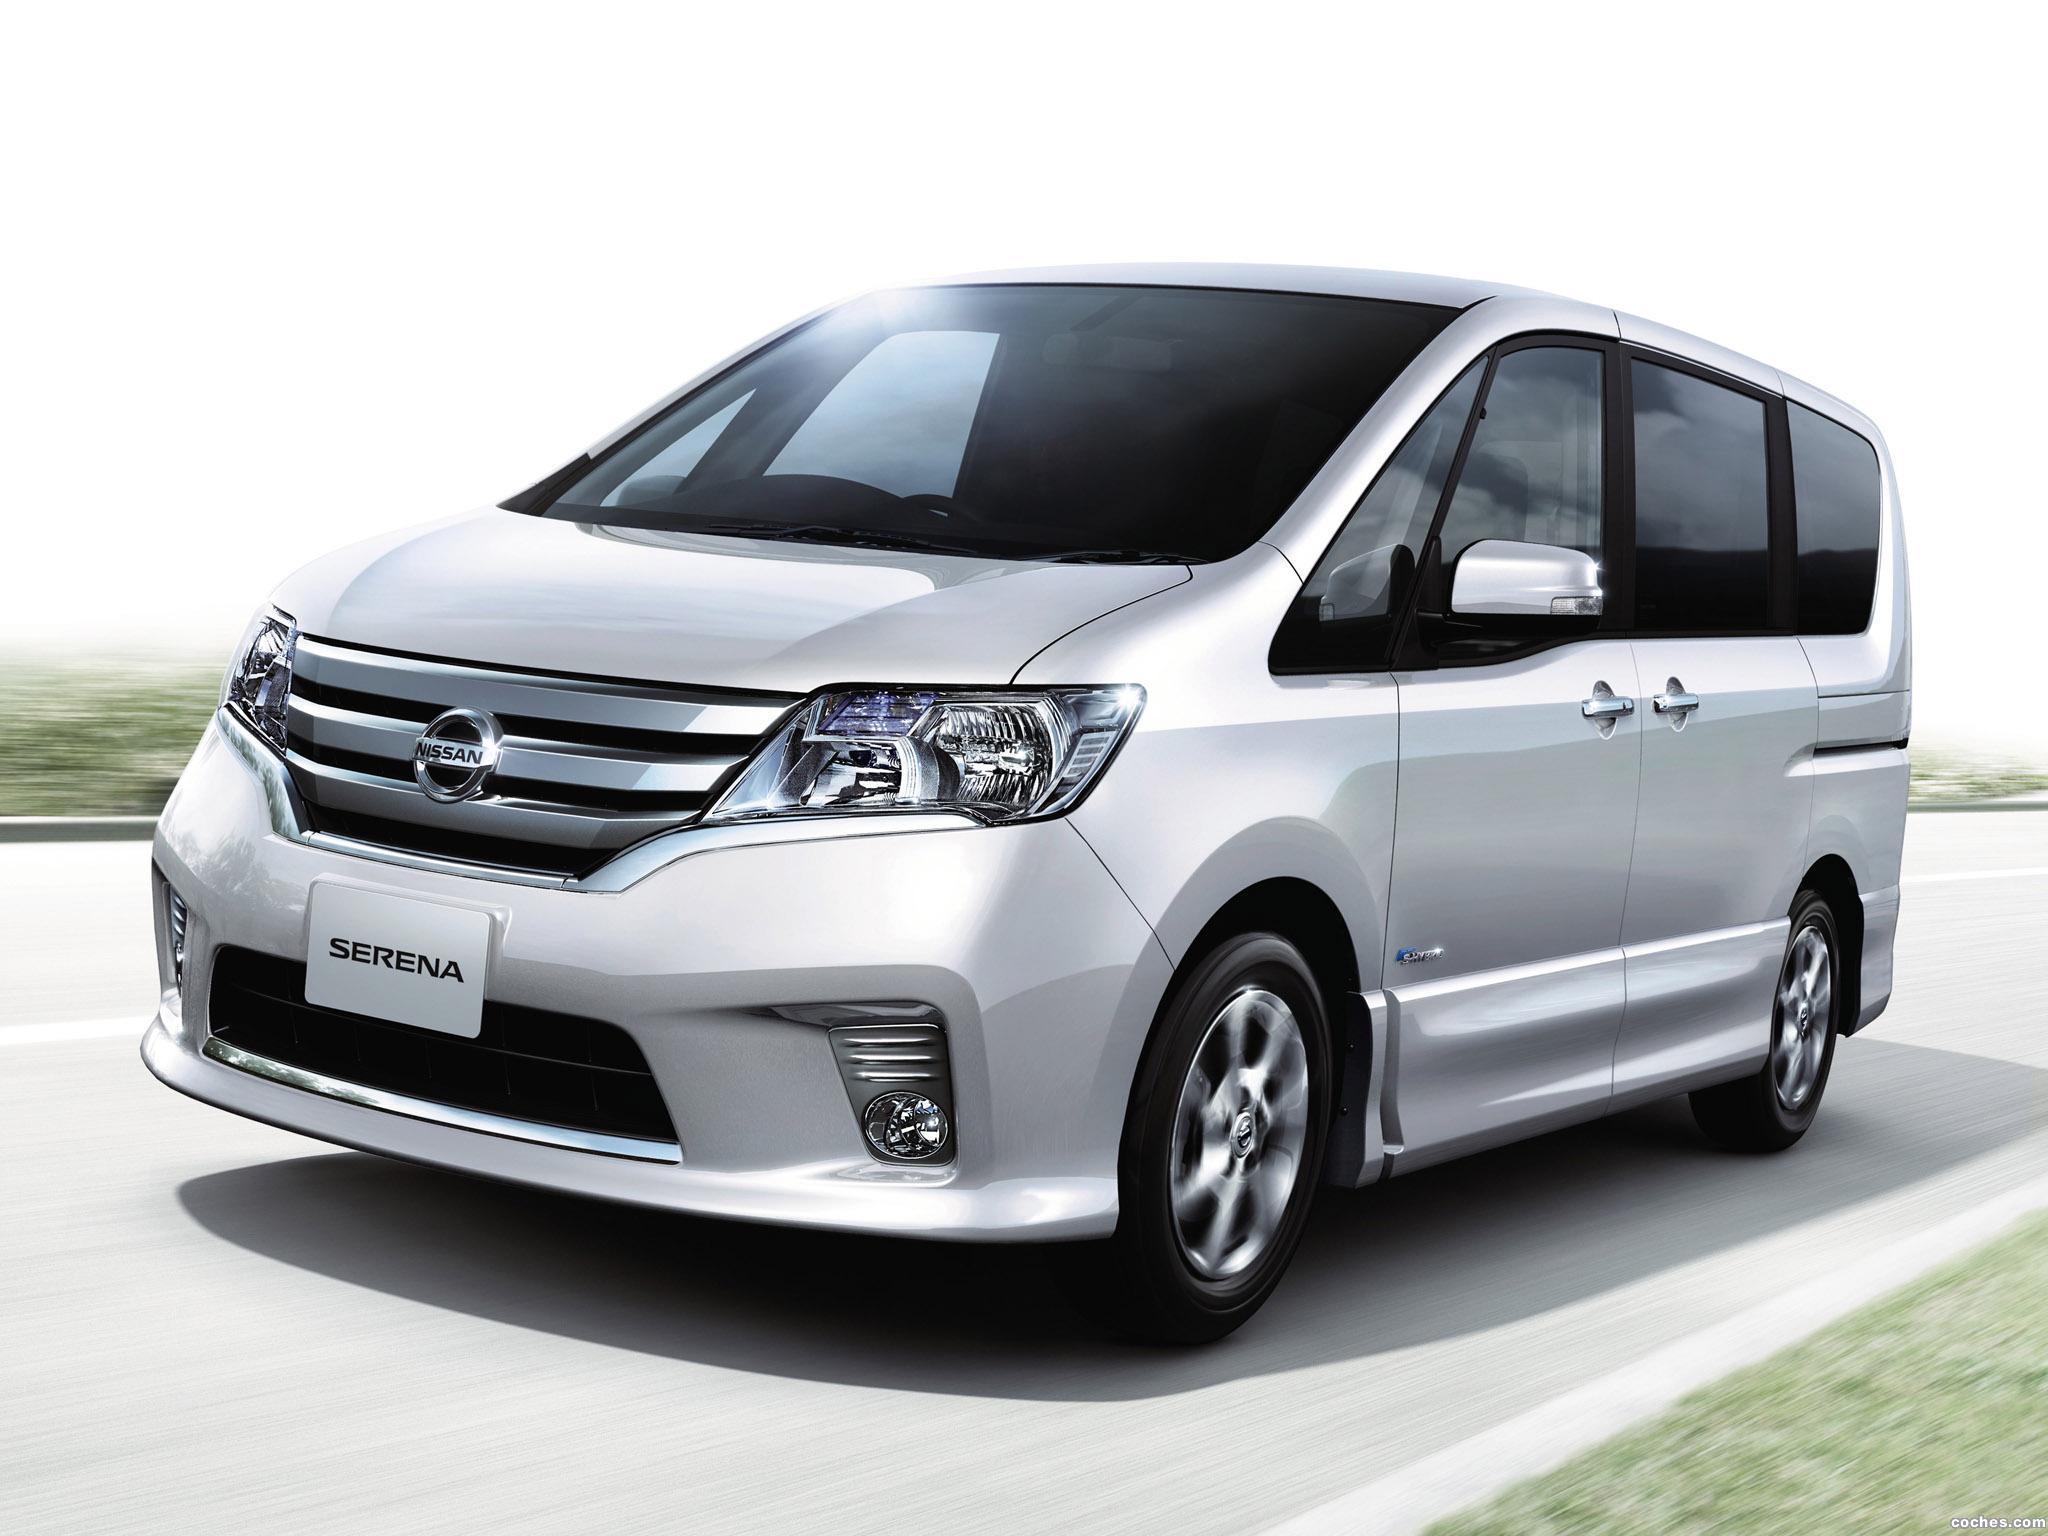 Foto 0 de Nissan Serena Highway Star S Hybrid C26 2012